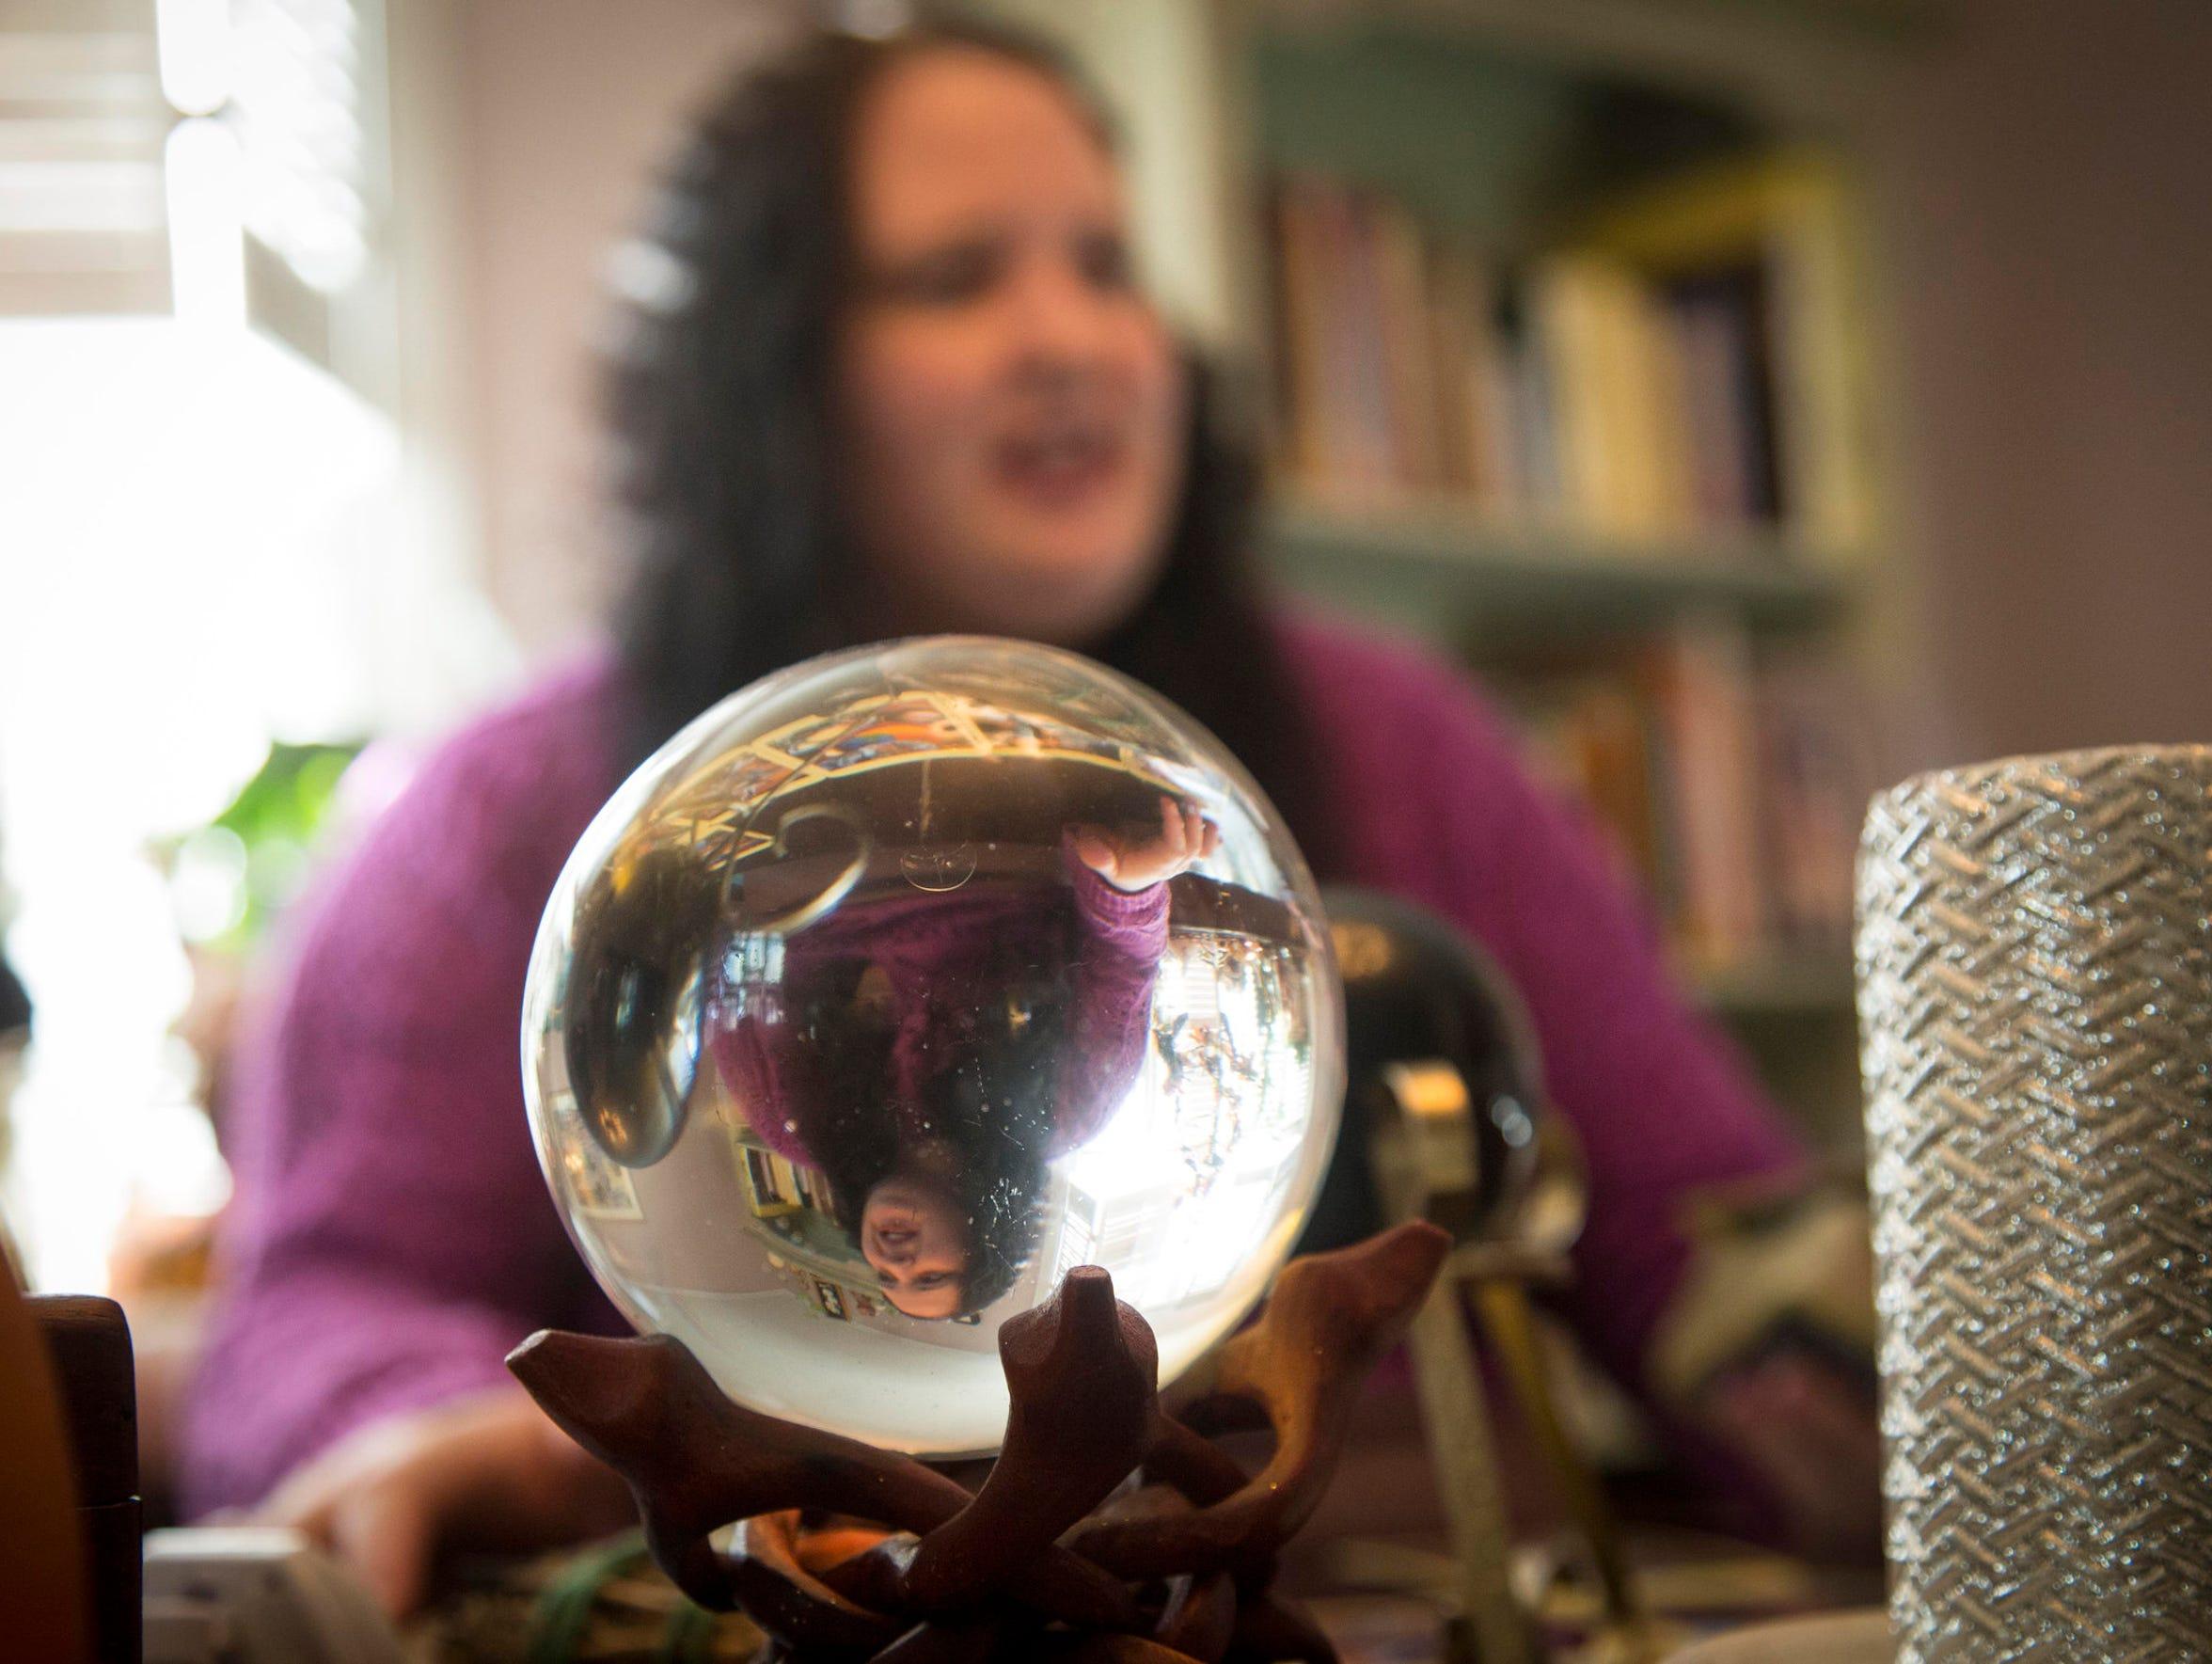 Vision Psychics' Ula Yule does a tarot card reading